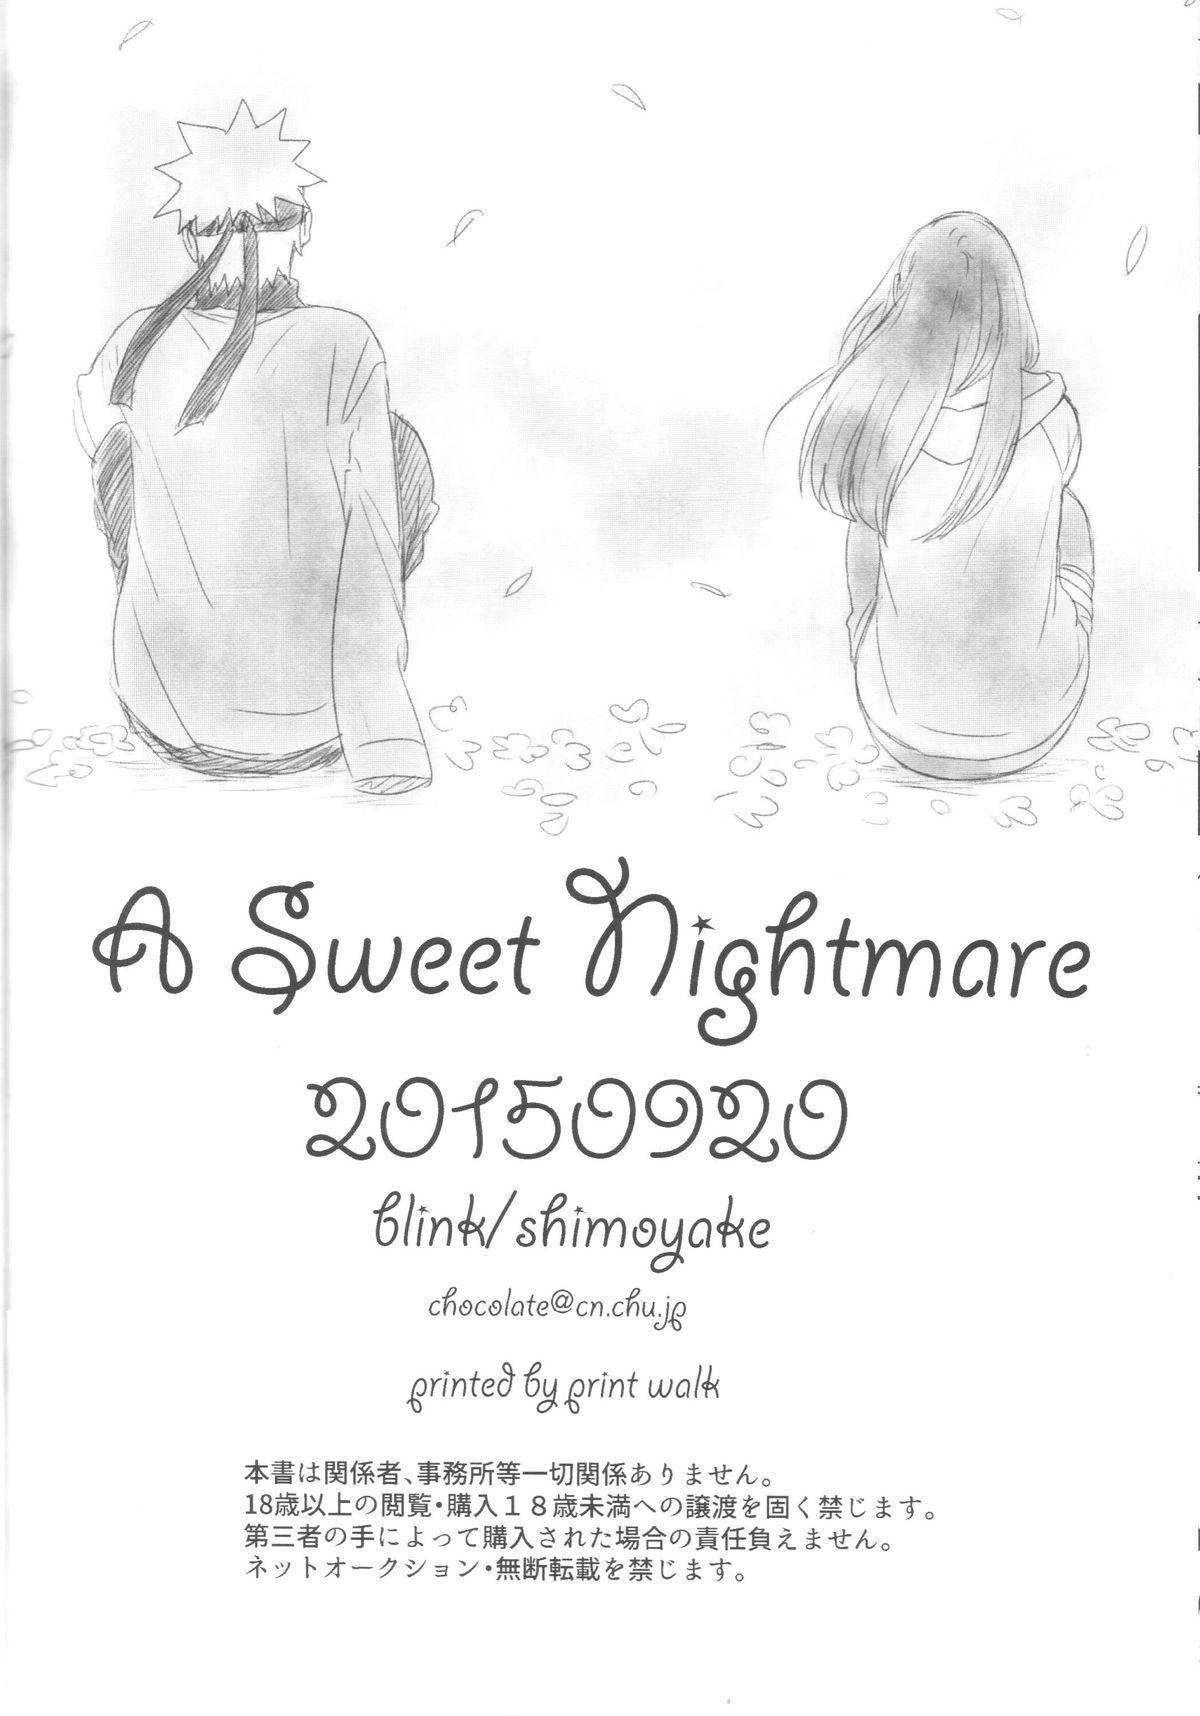 A Sweet Nightmare 89